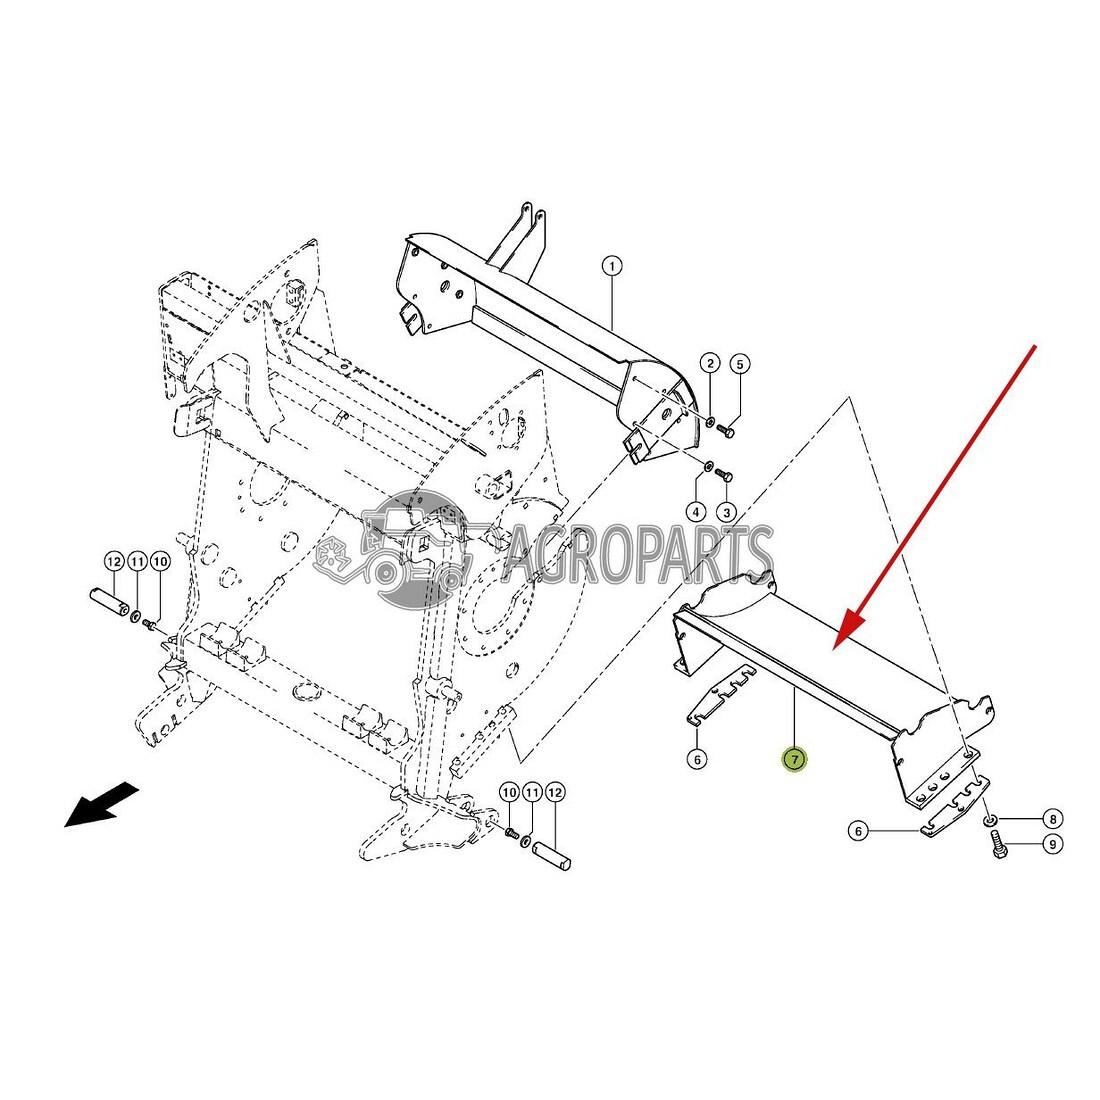 Forage Harvester Parts Claas Discharge Drum bottom